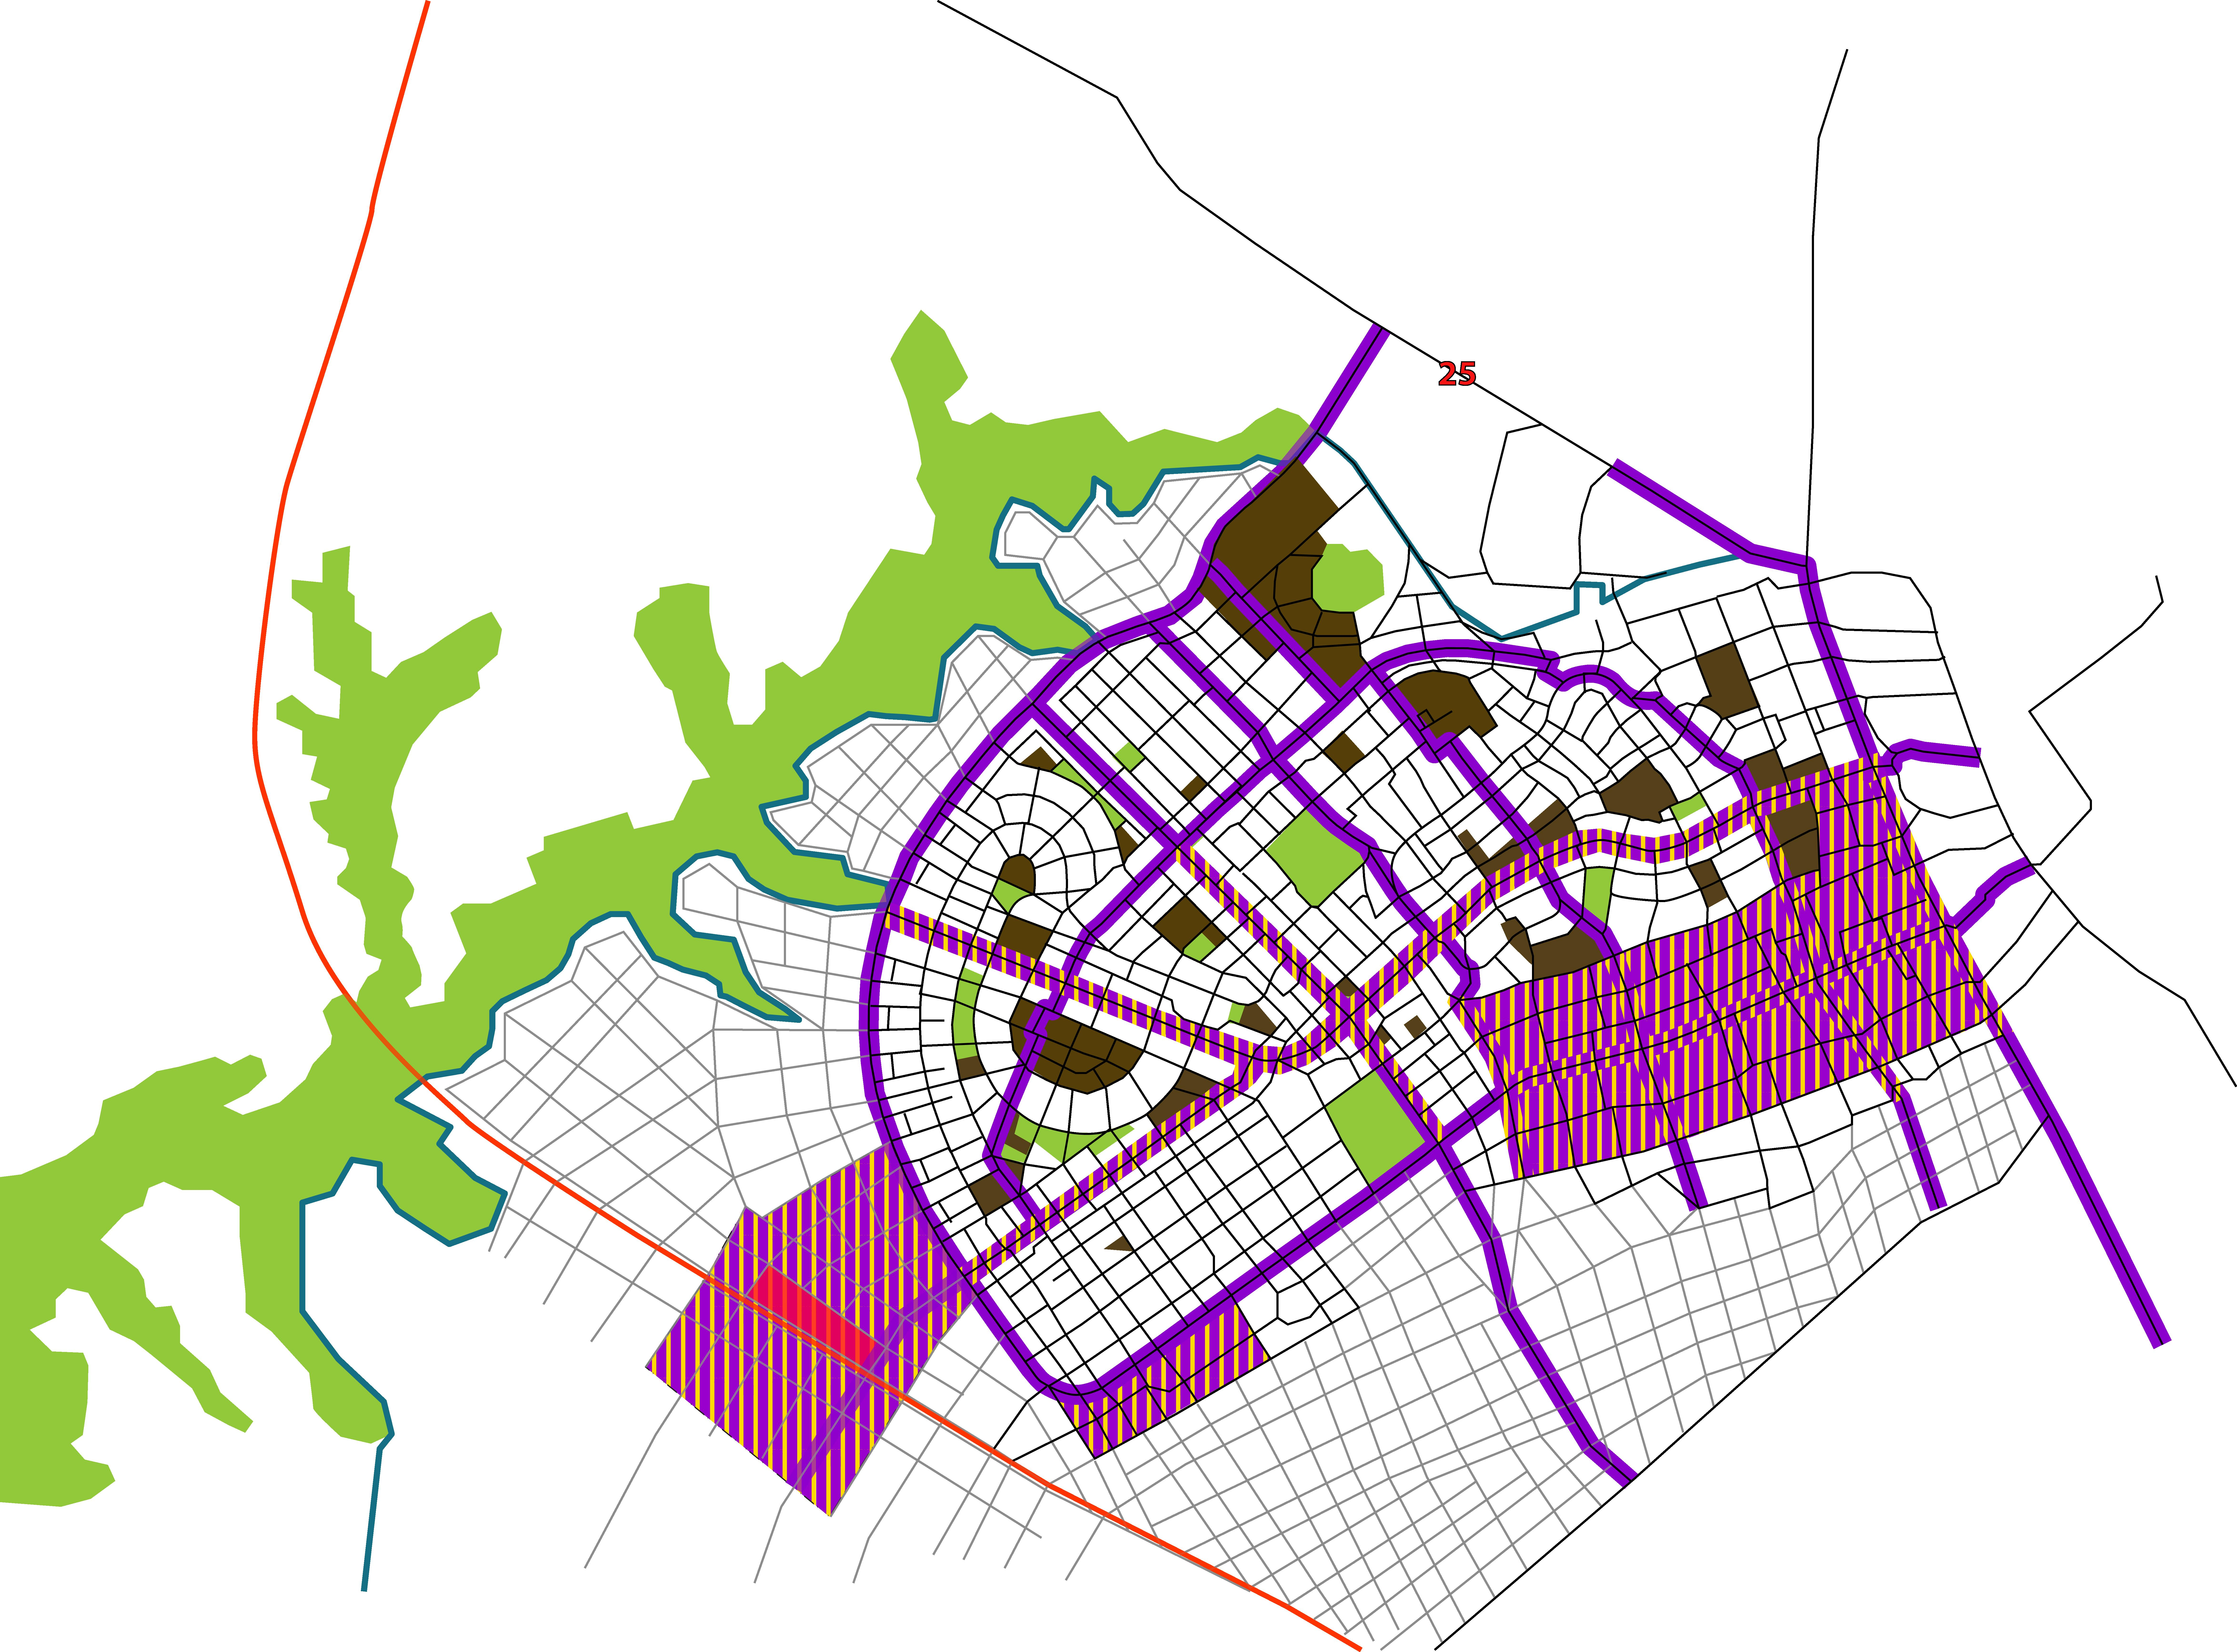 New city land uses